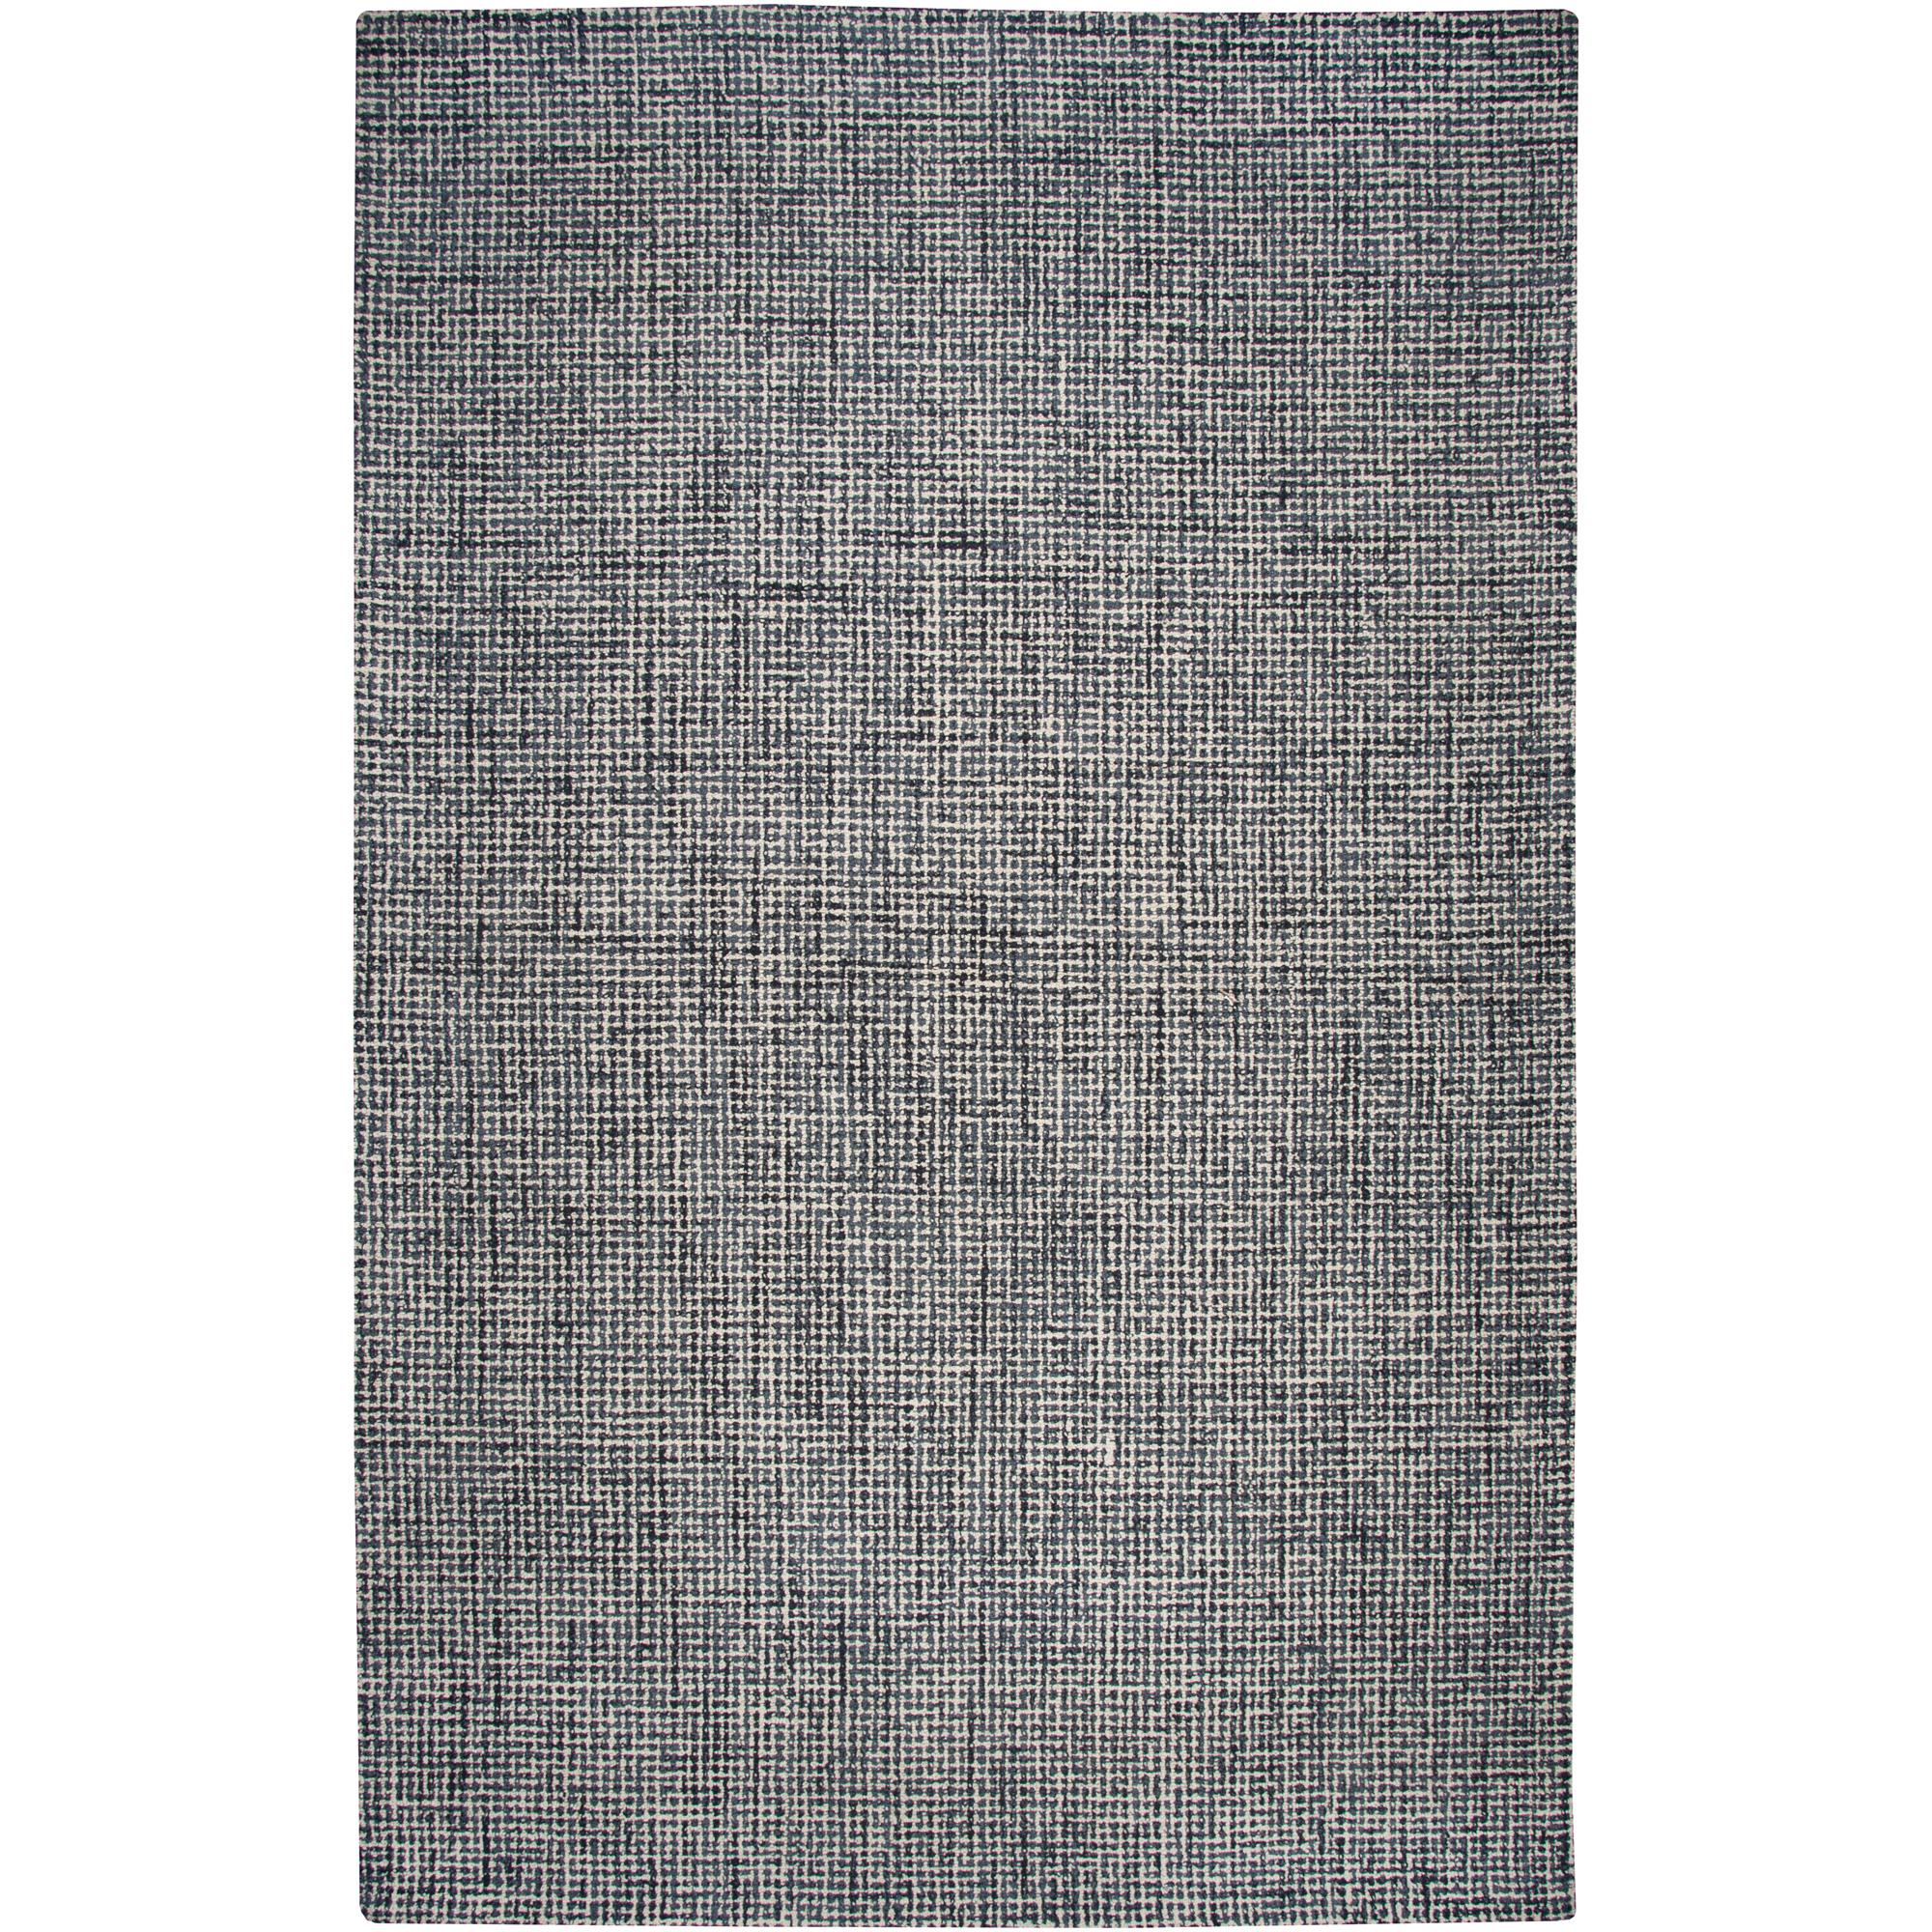 Rizzy Home | Brindleton Black 5x8 Area Rug